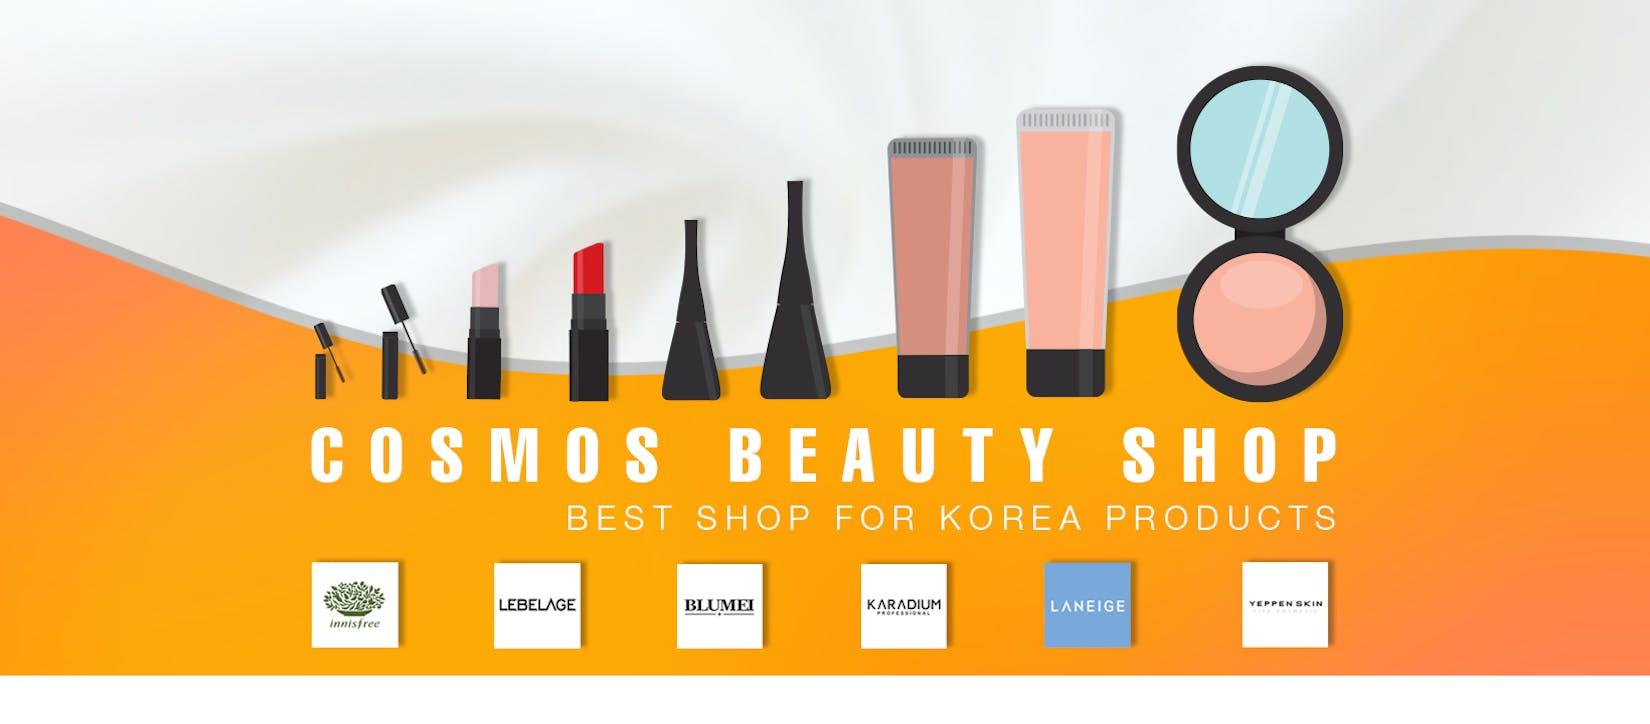 Cosmos Beauty Shop | Beauty